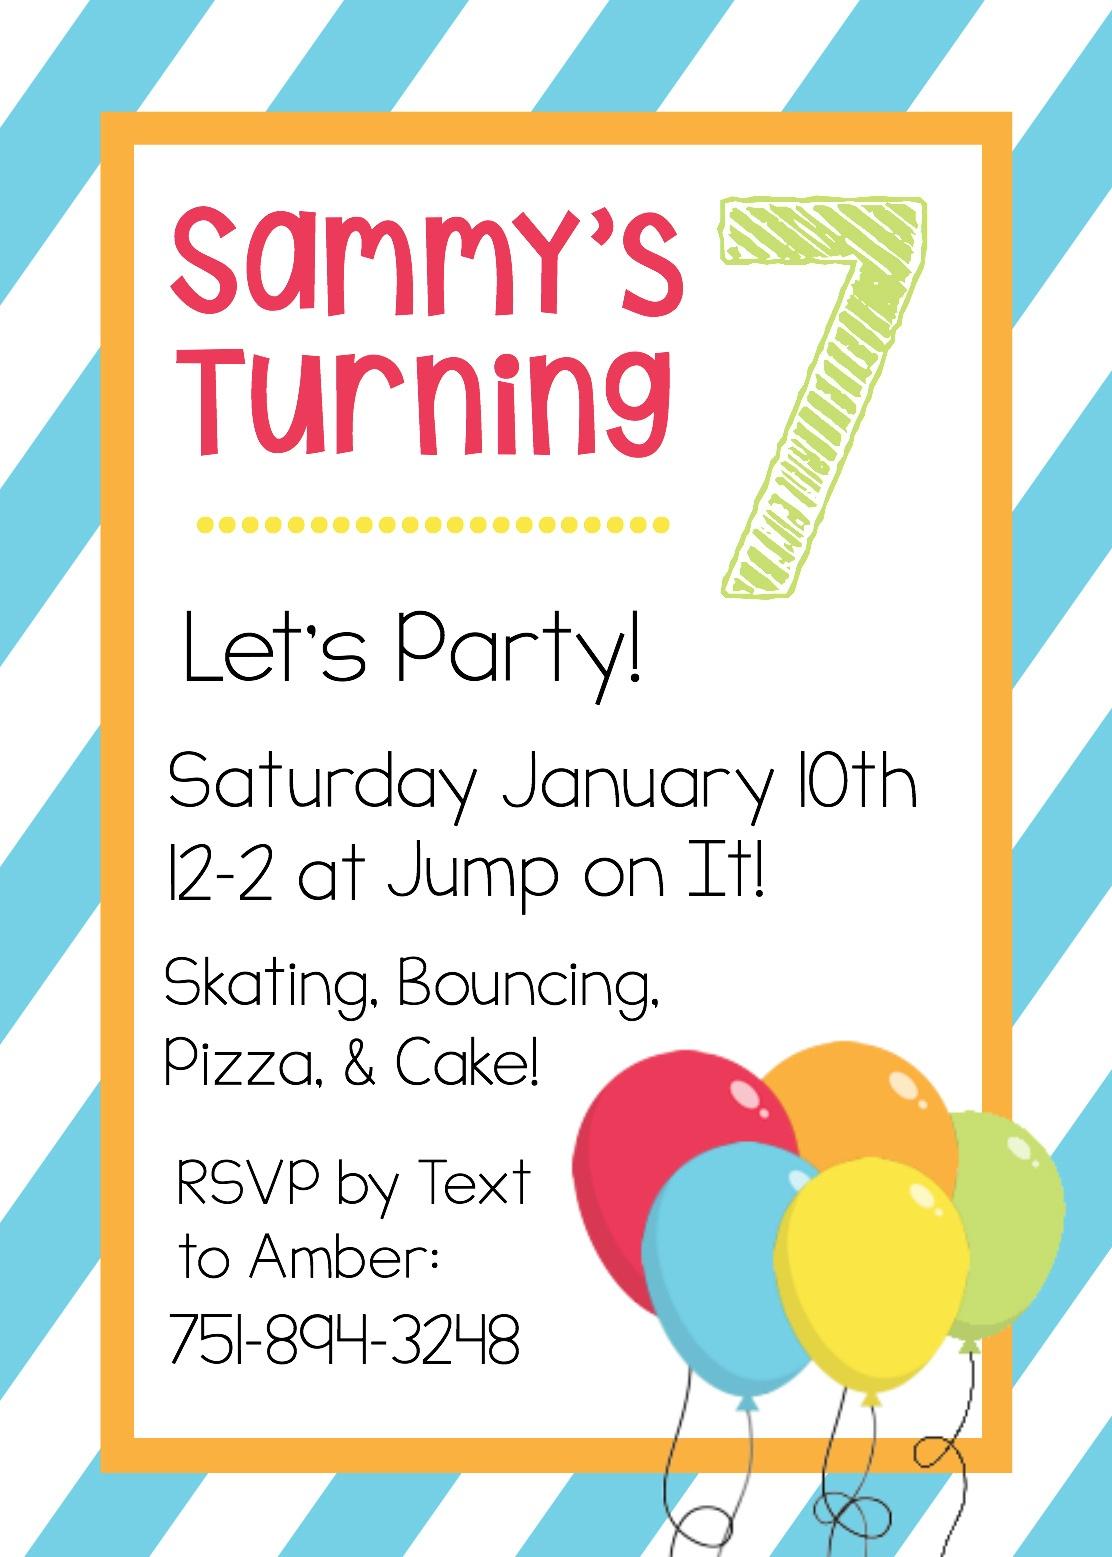 Free Printable Birthday Invitation Templates - Free Printable Girl Birthday Invitations